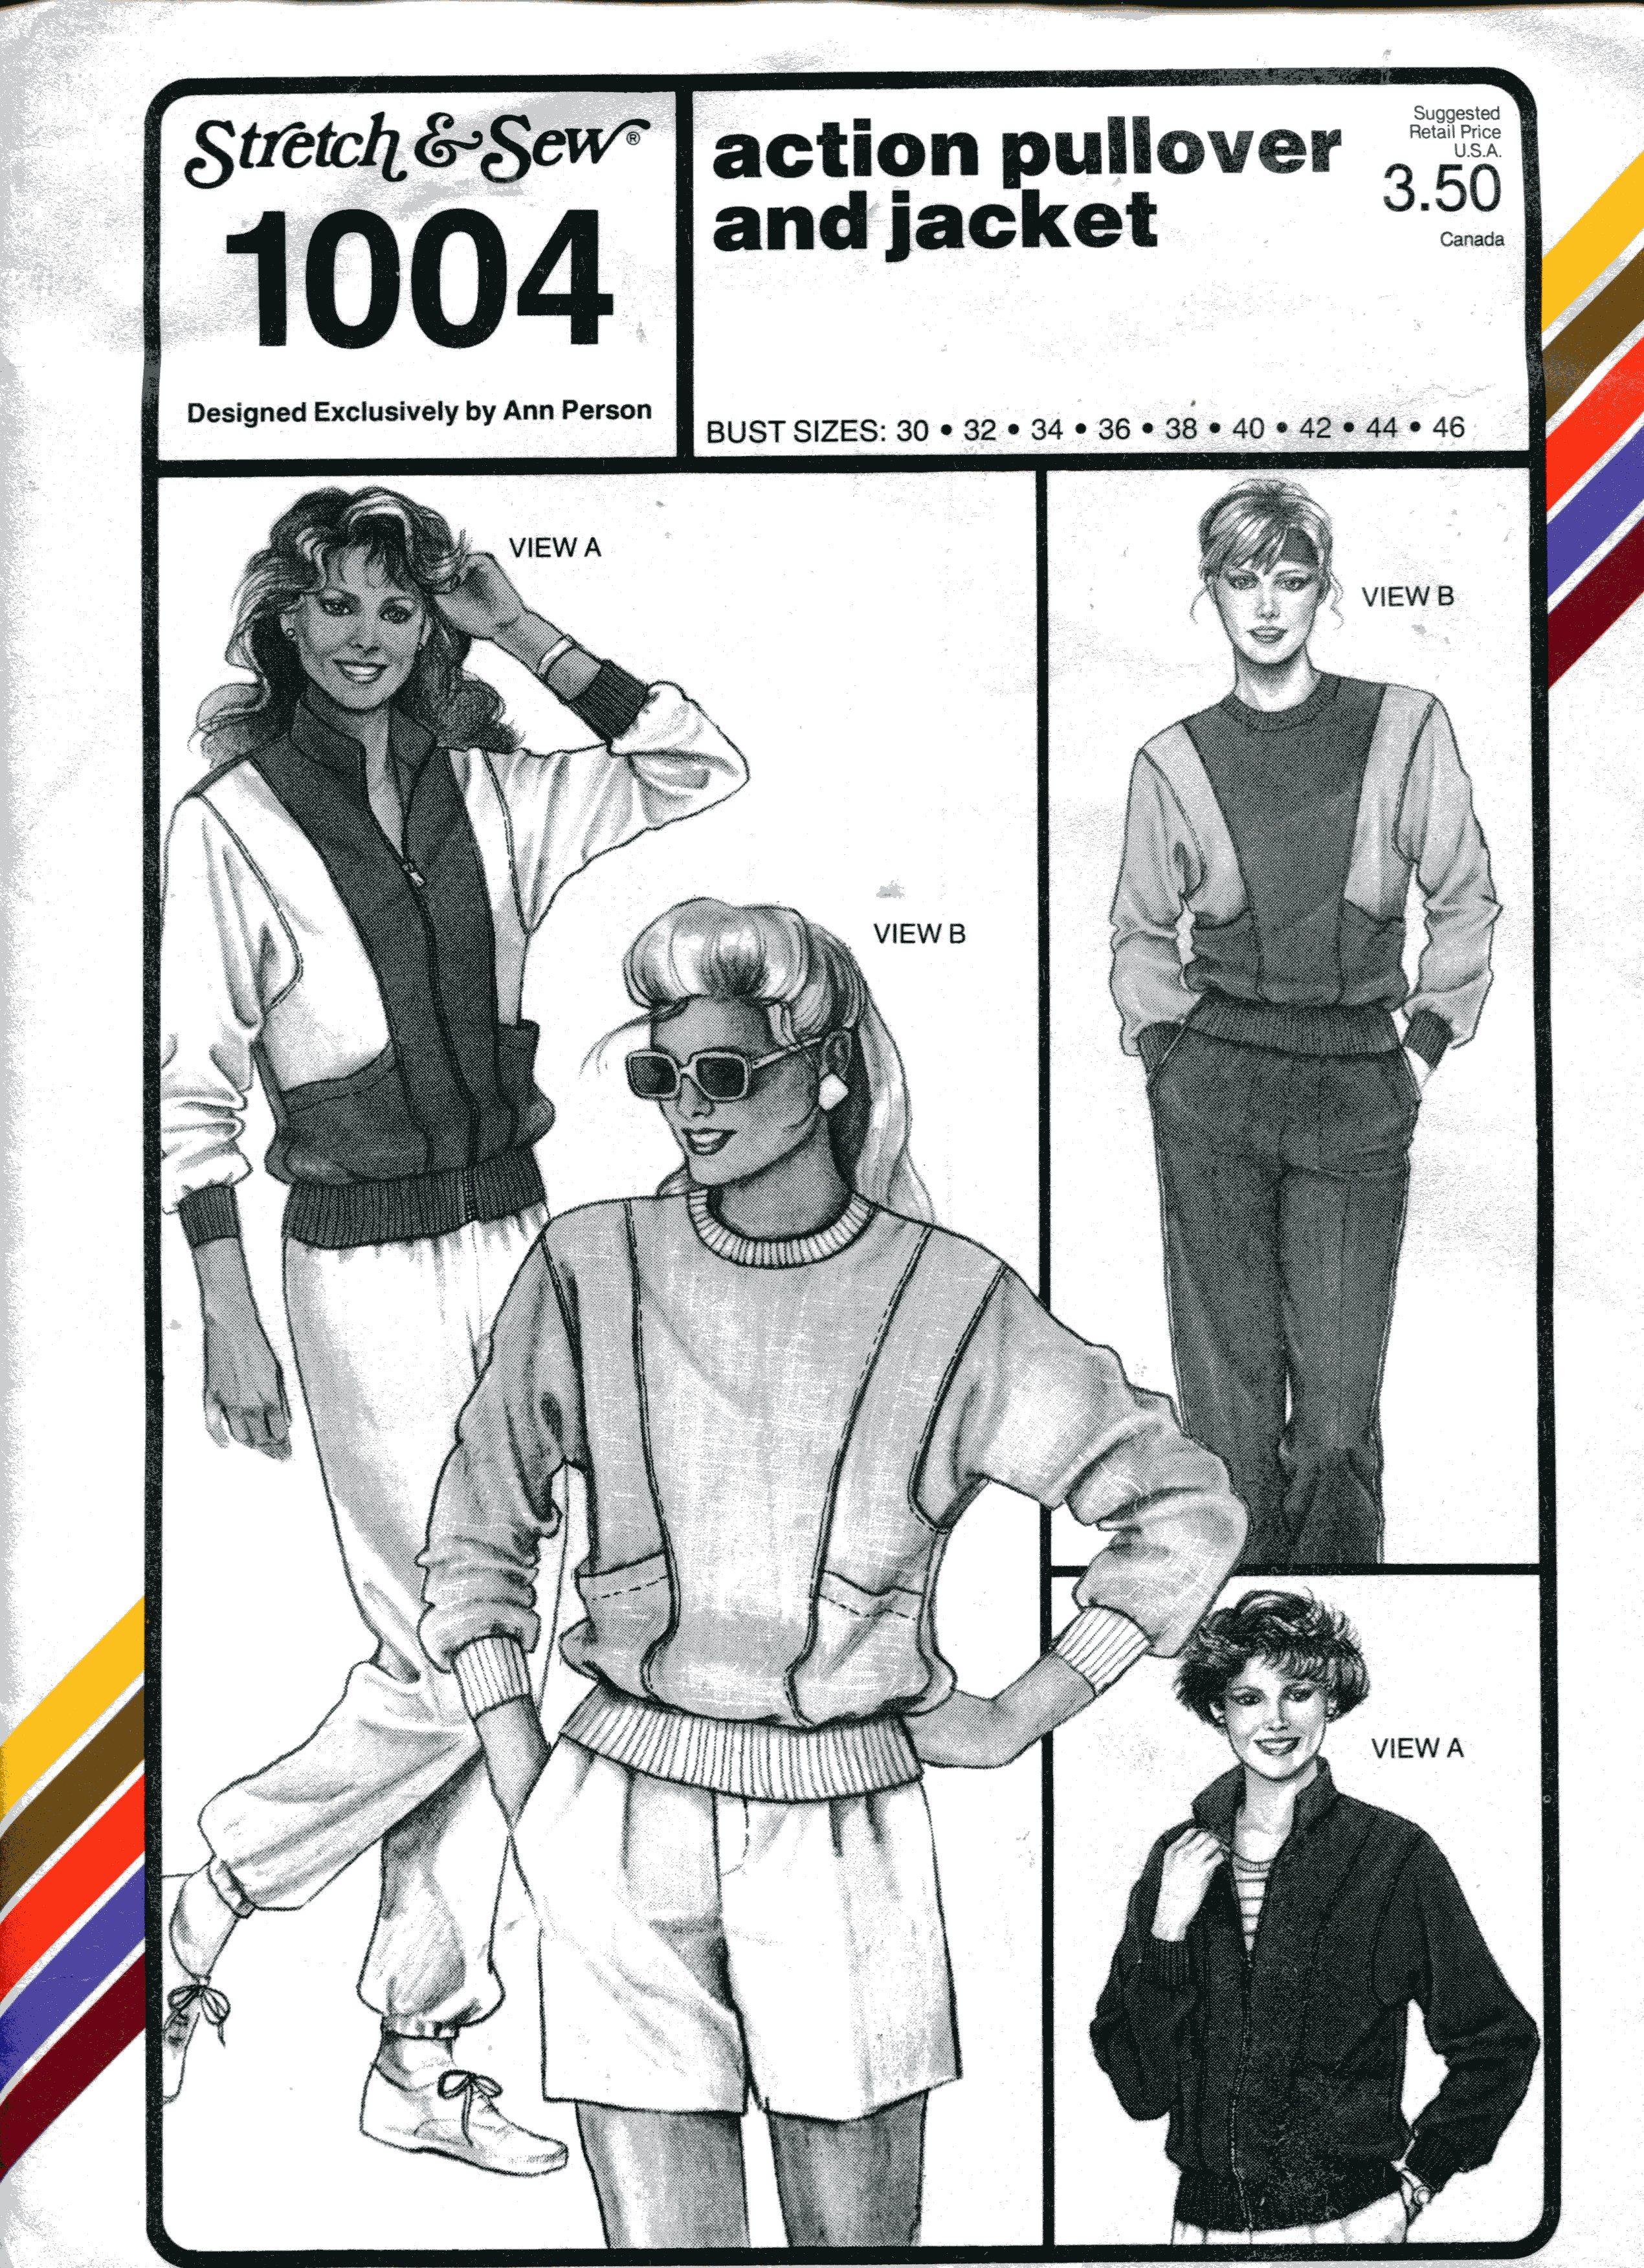 Stretch & Sew 1004